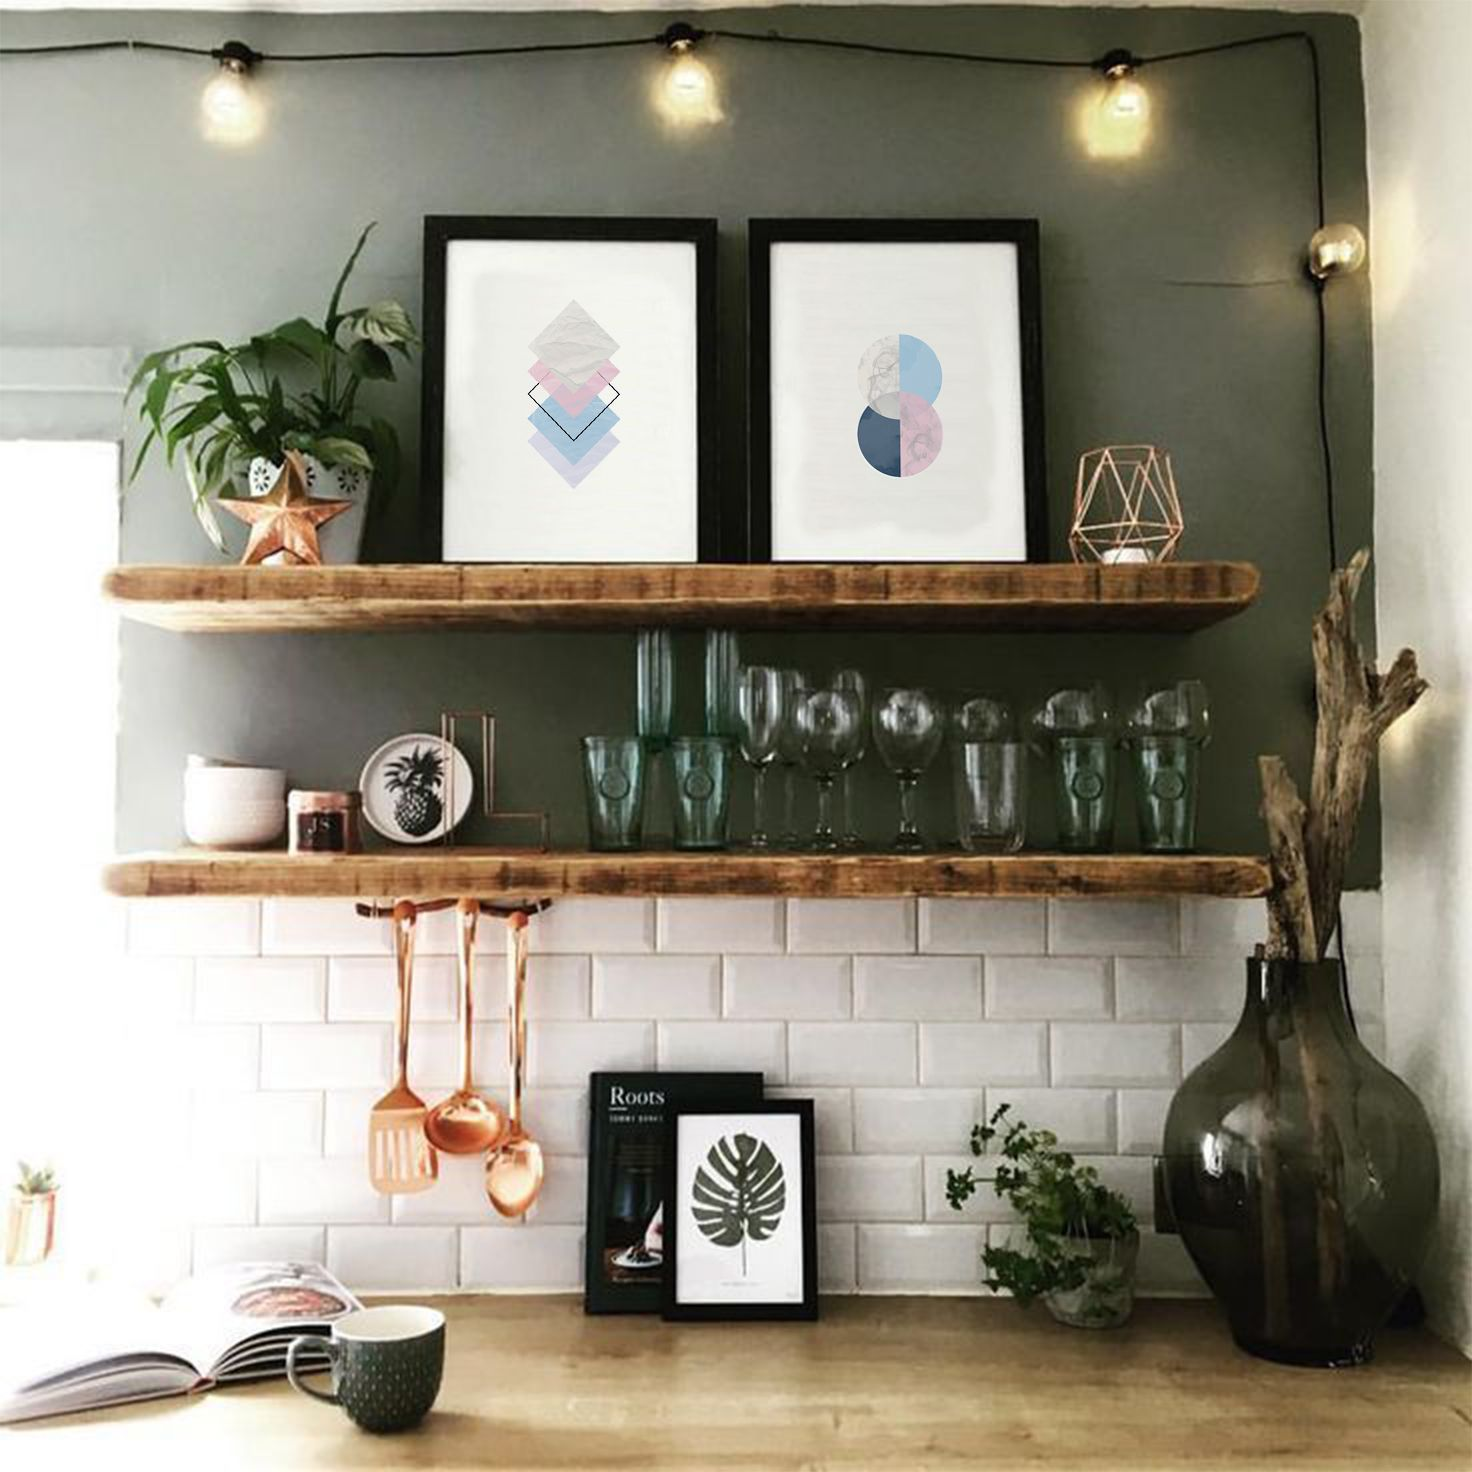 Photo of kitchen diy ideas